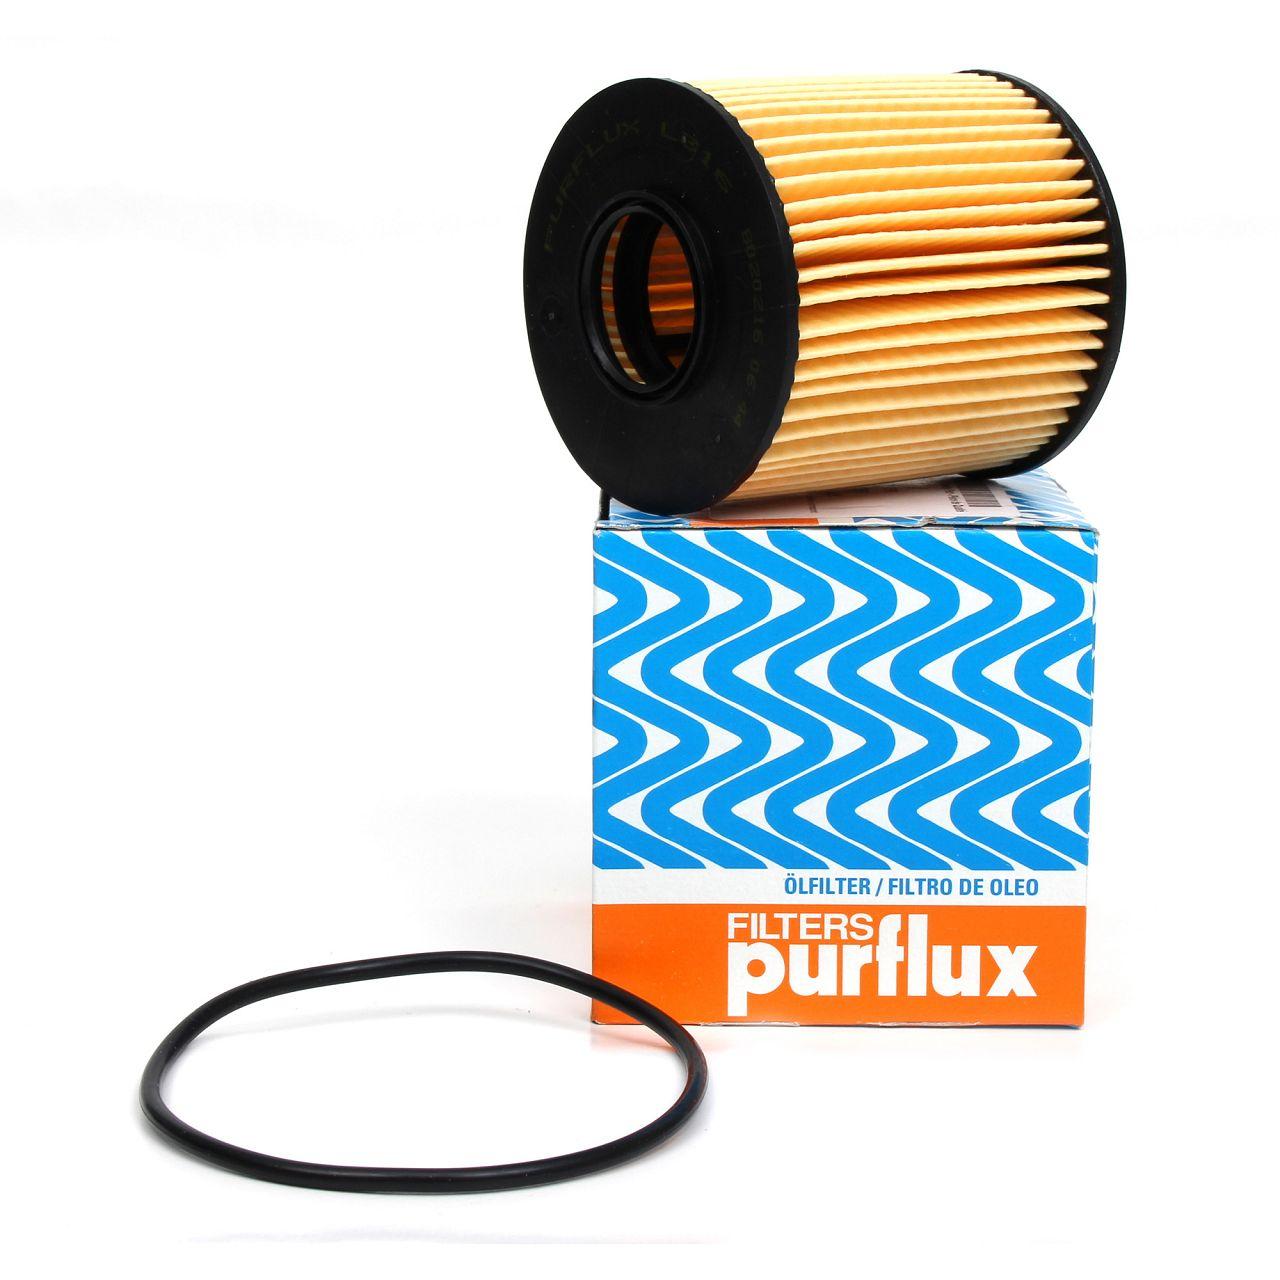 PURFLUX L316 Ölfilter VOLVO C70 S40 S60 S70 S80 V40 V70 XC70 XC90 1275810